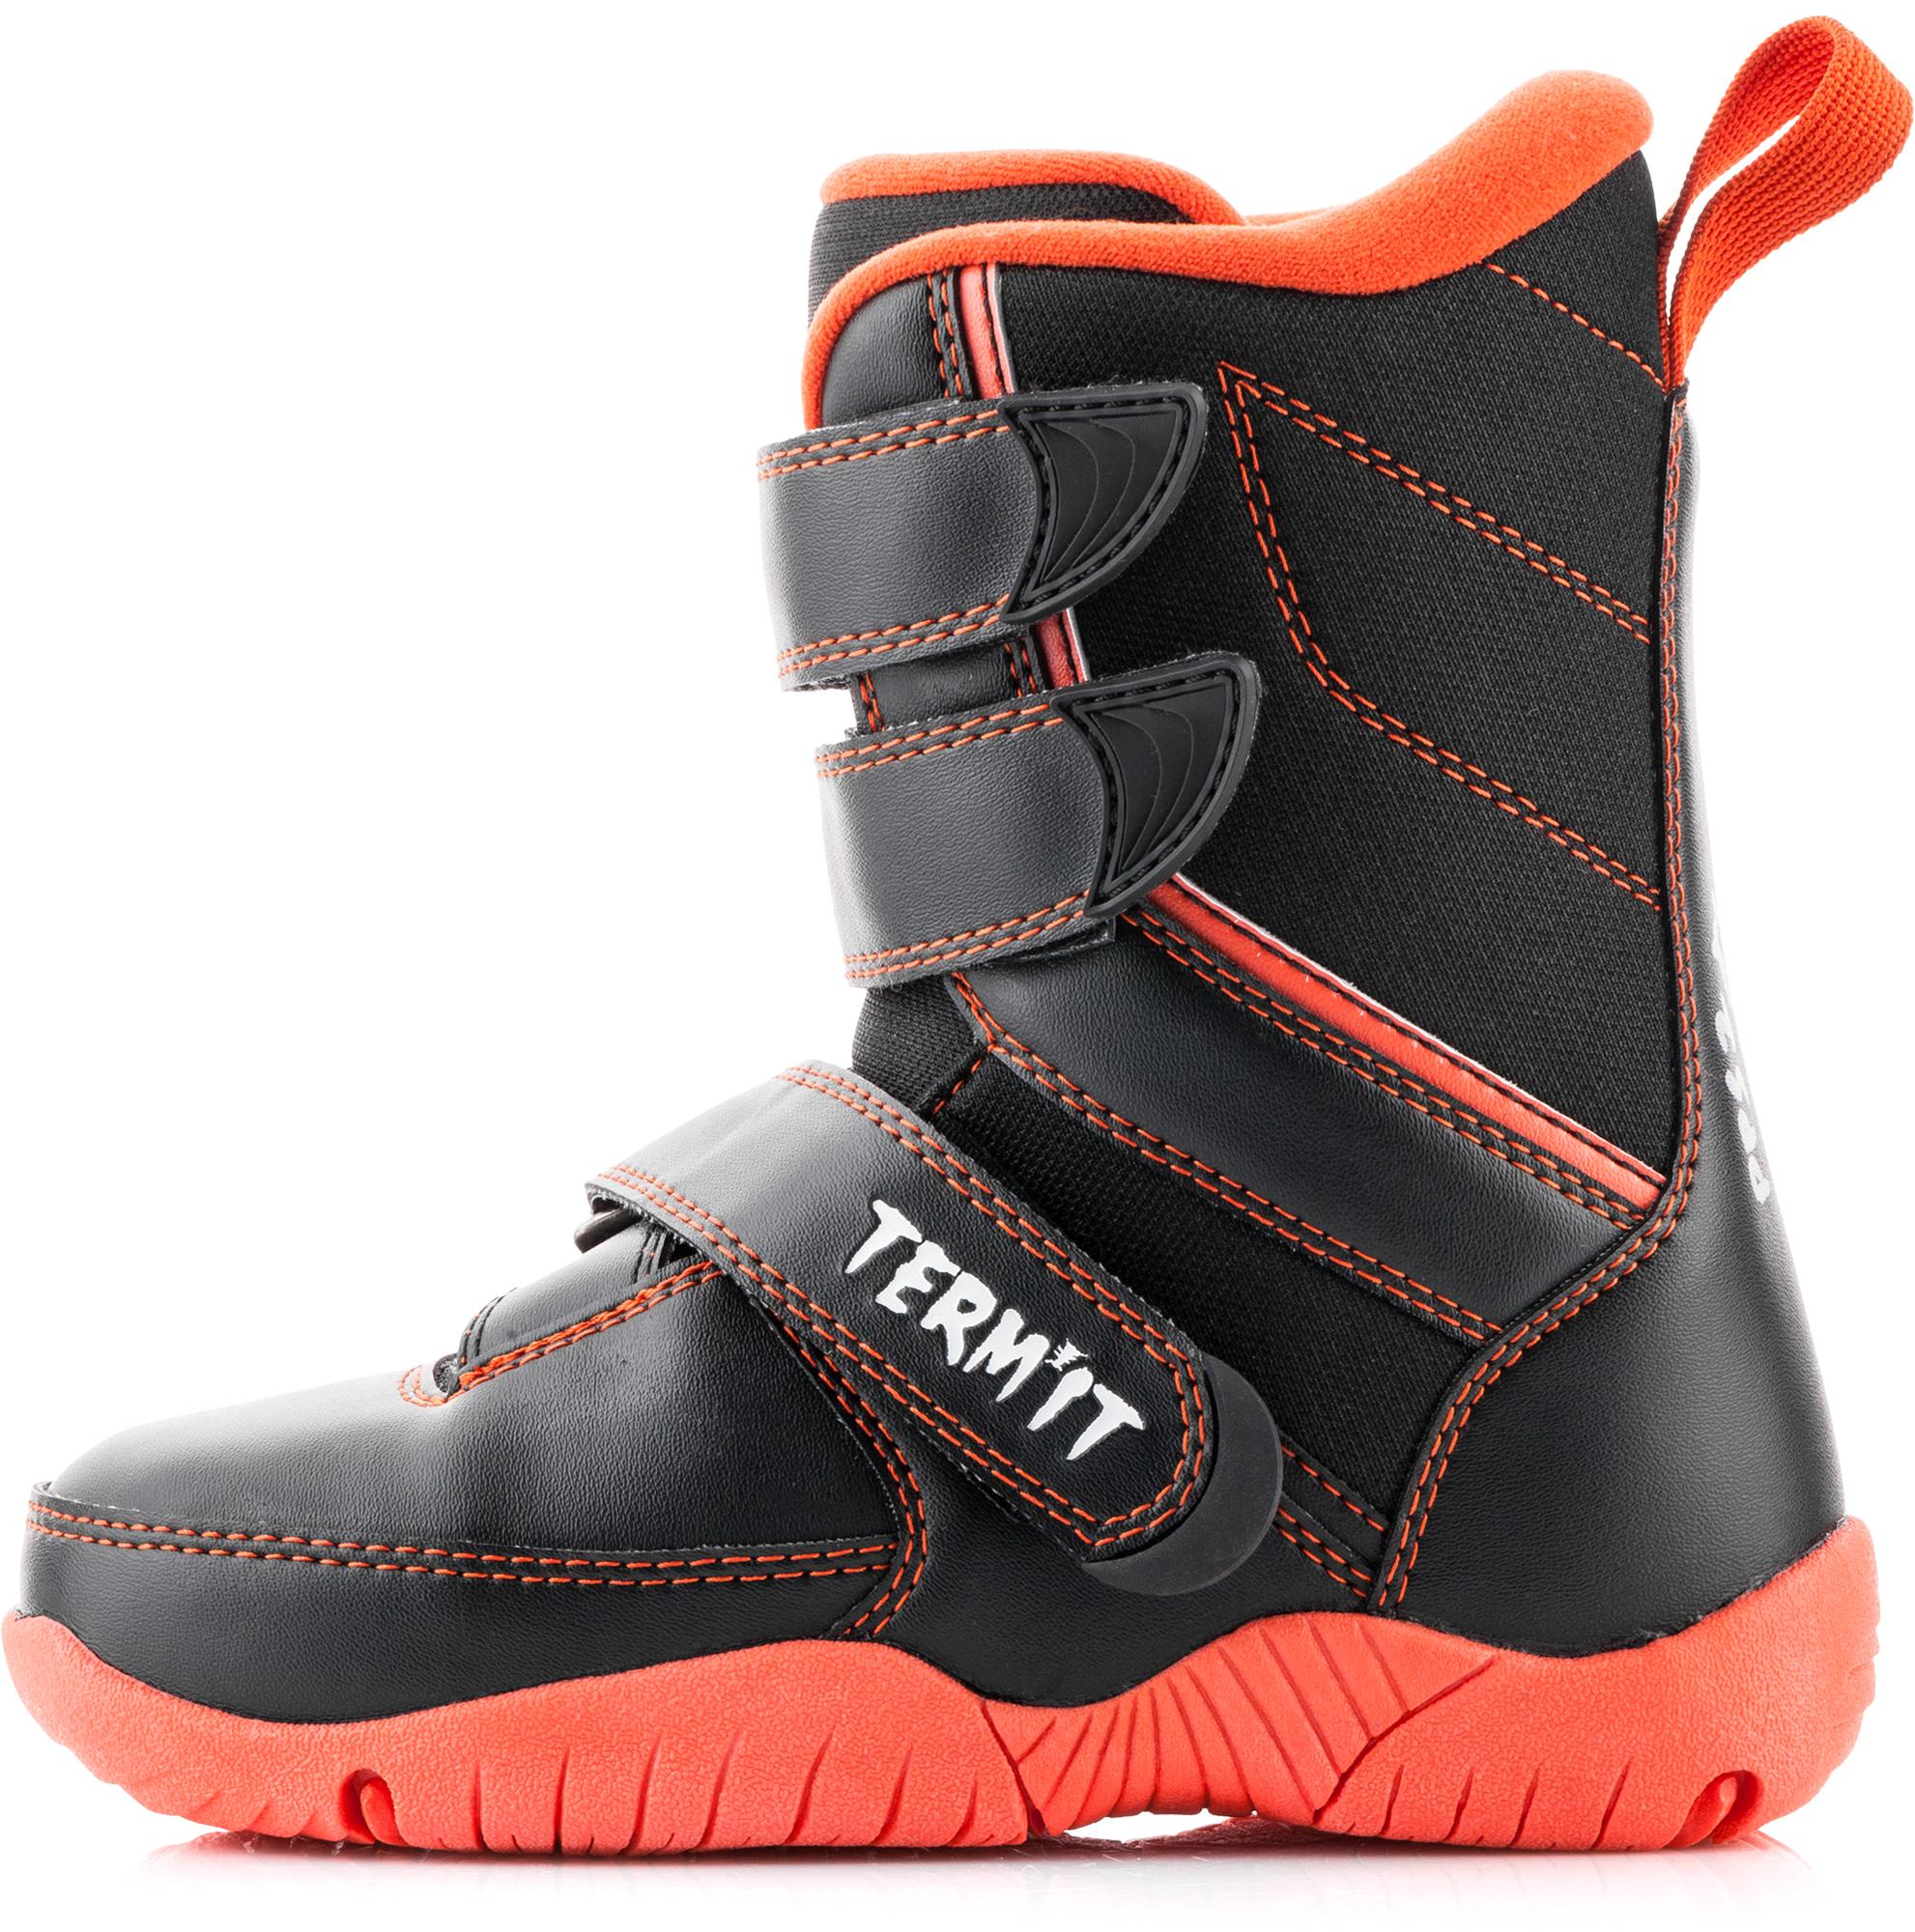 Termit Ботинки сноубордические детские Termit Pilgrim termit ботинки сноубордические женские termit zephyr